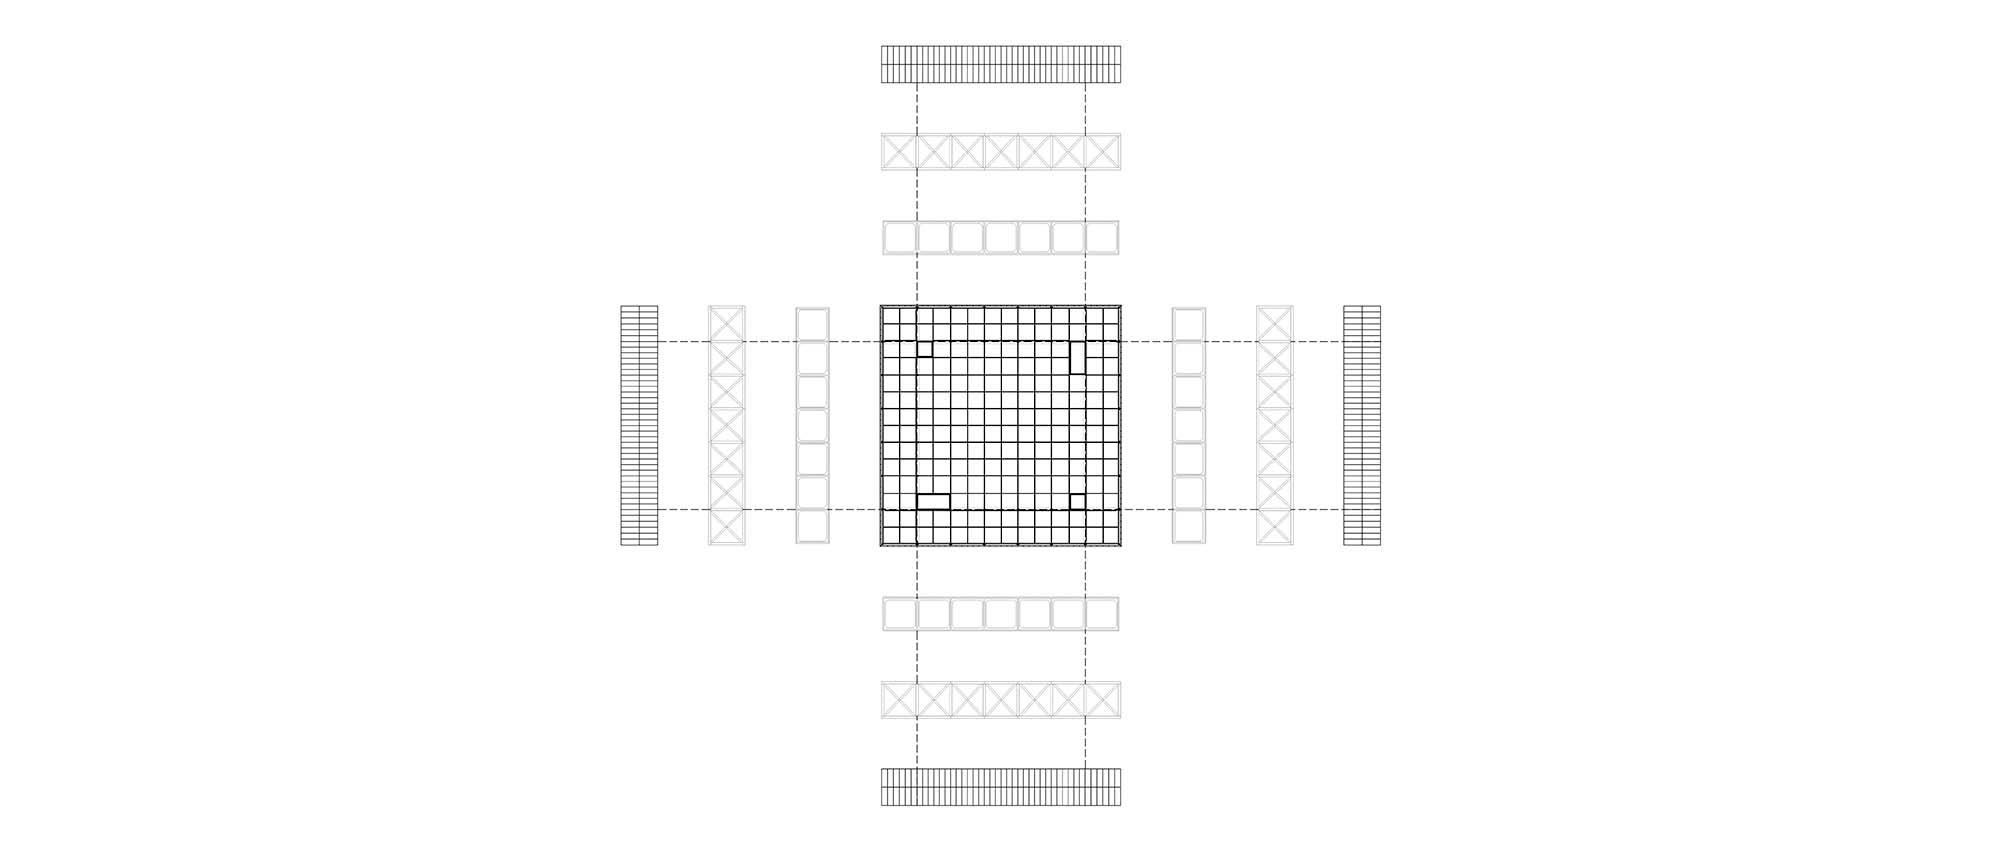 esquema estructura_fdf.jpg